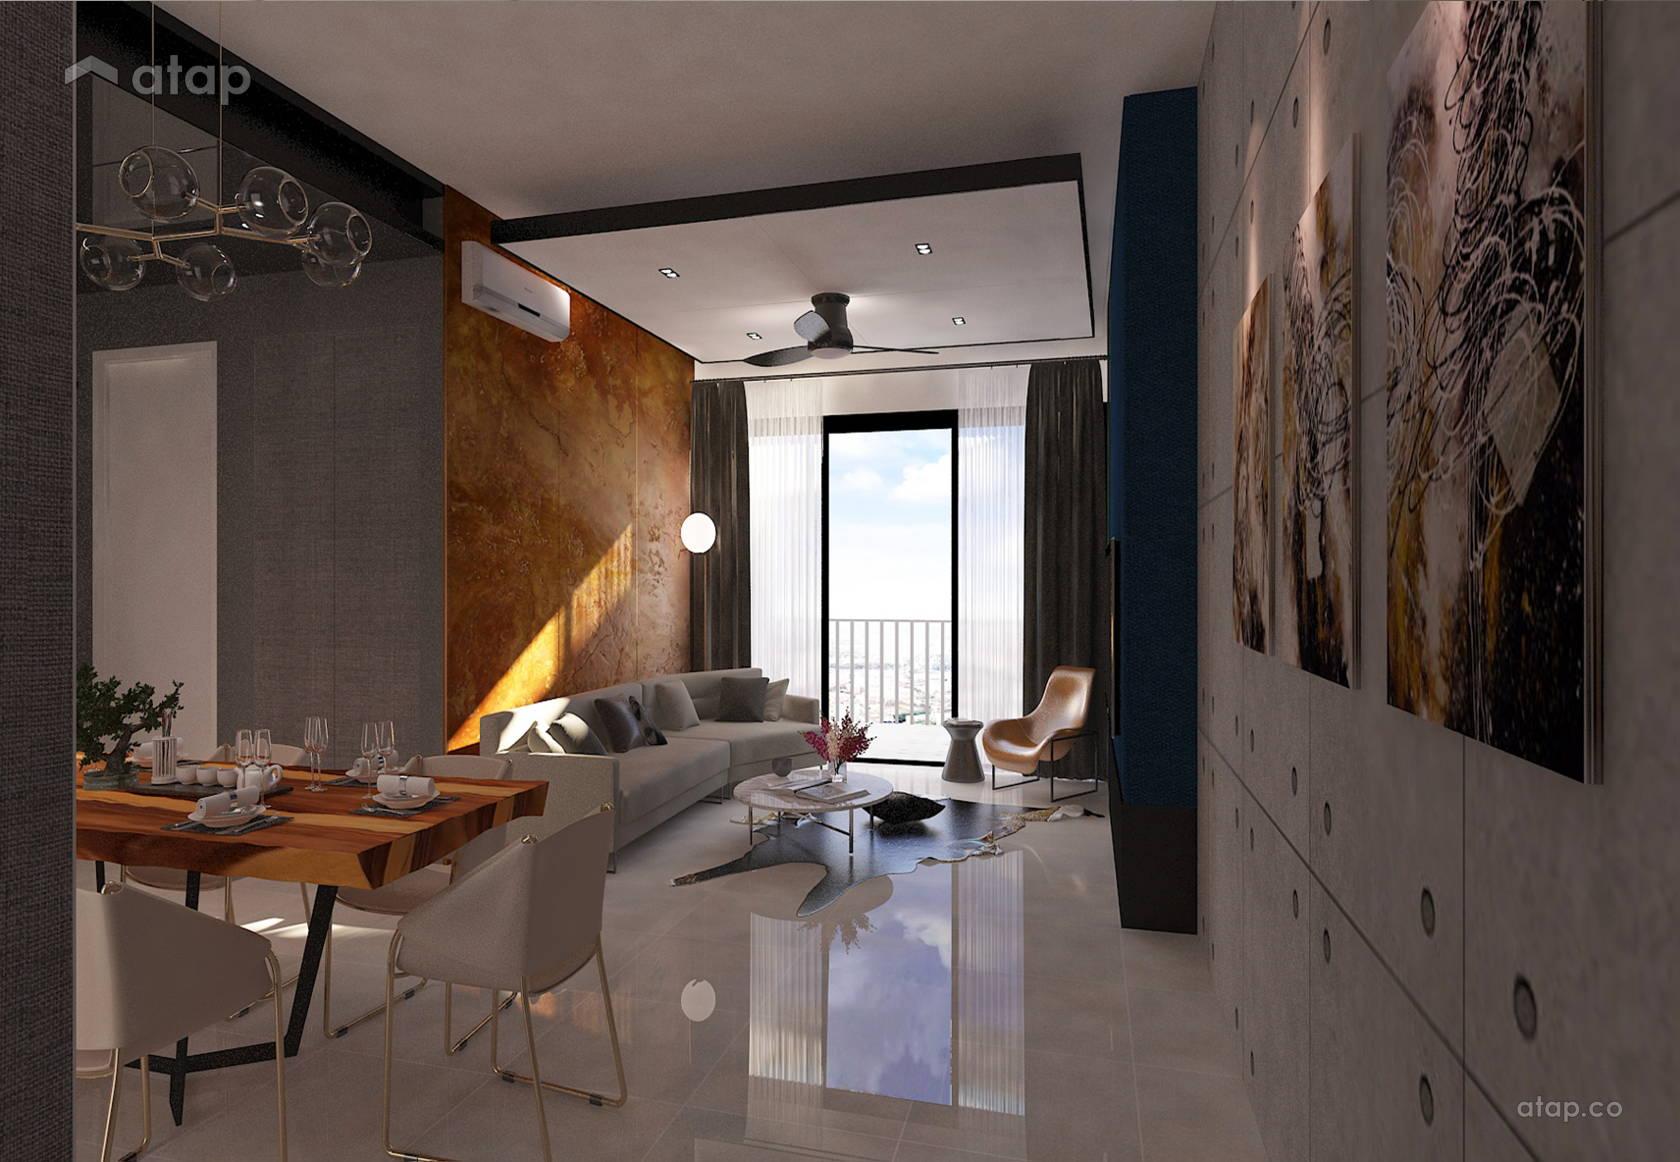 Gallery In The Rainz At Bukit Jalil Contemporary Industrial Dining Room Living Condominium Design Ideas Photos Malaysia Atap Co